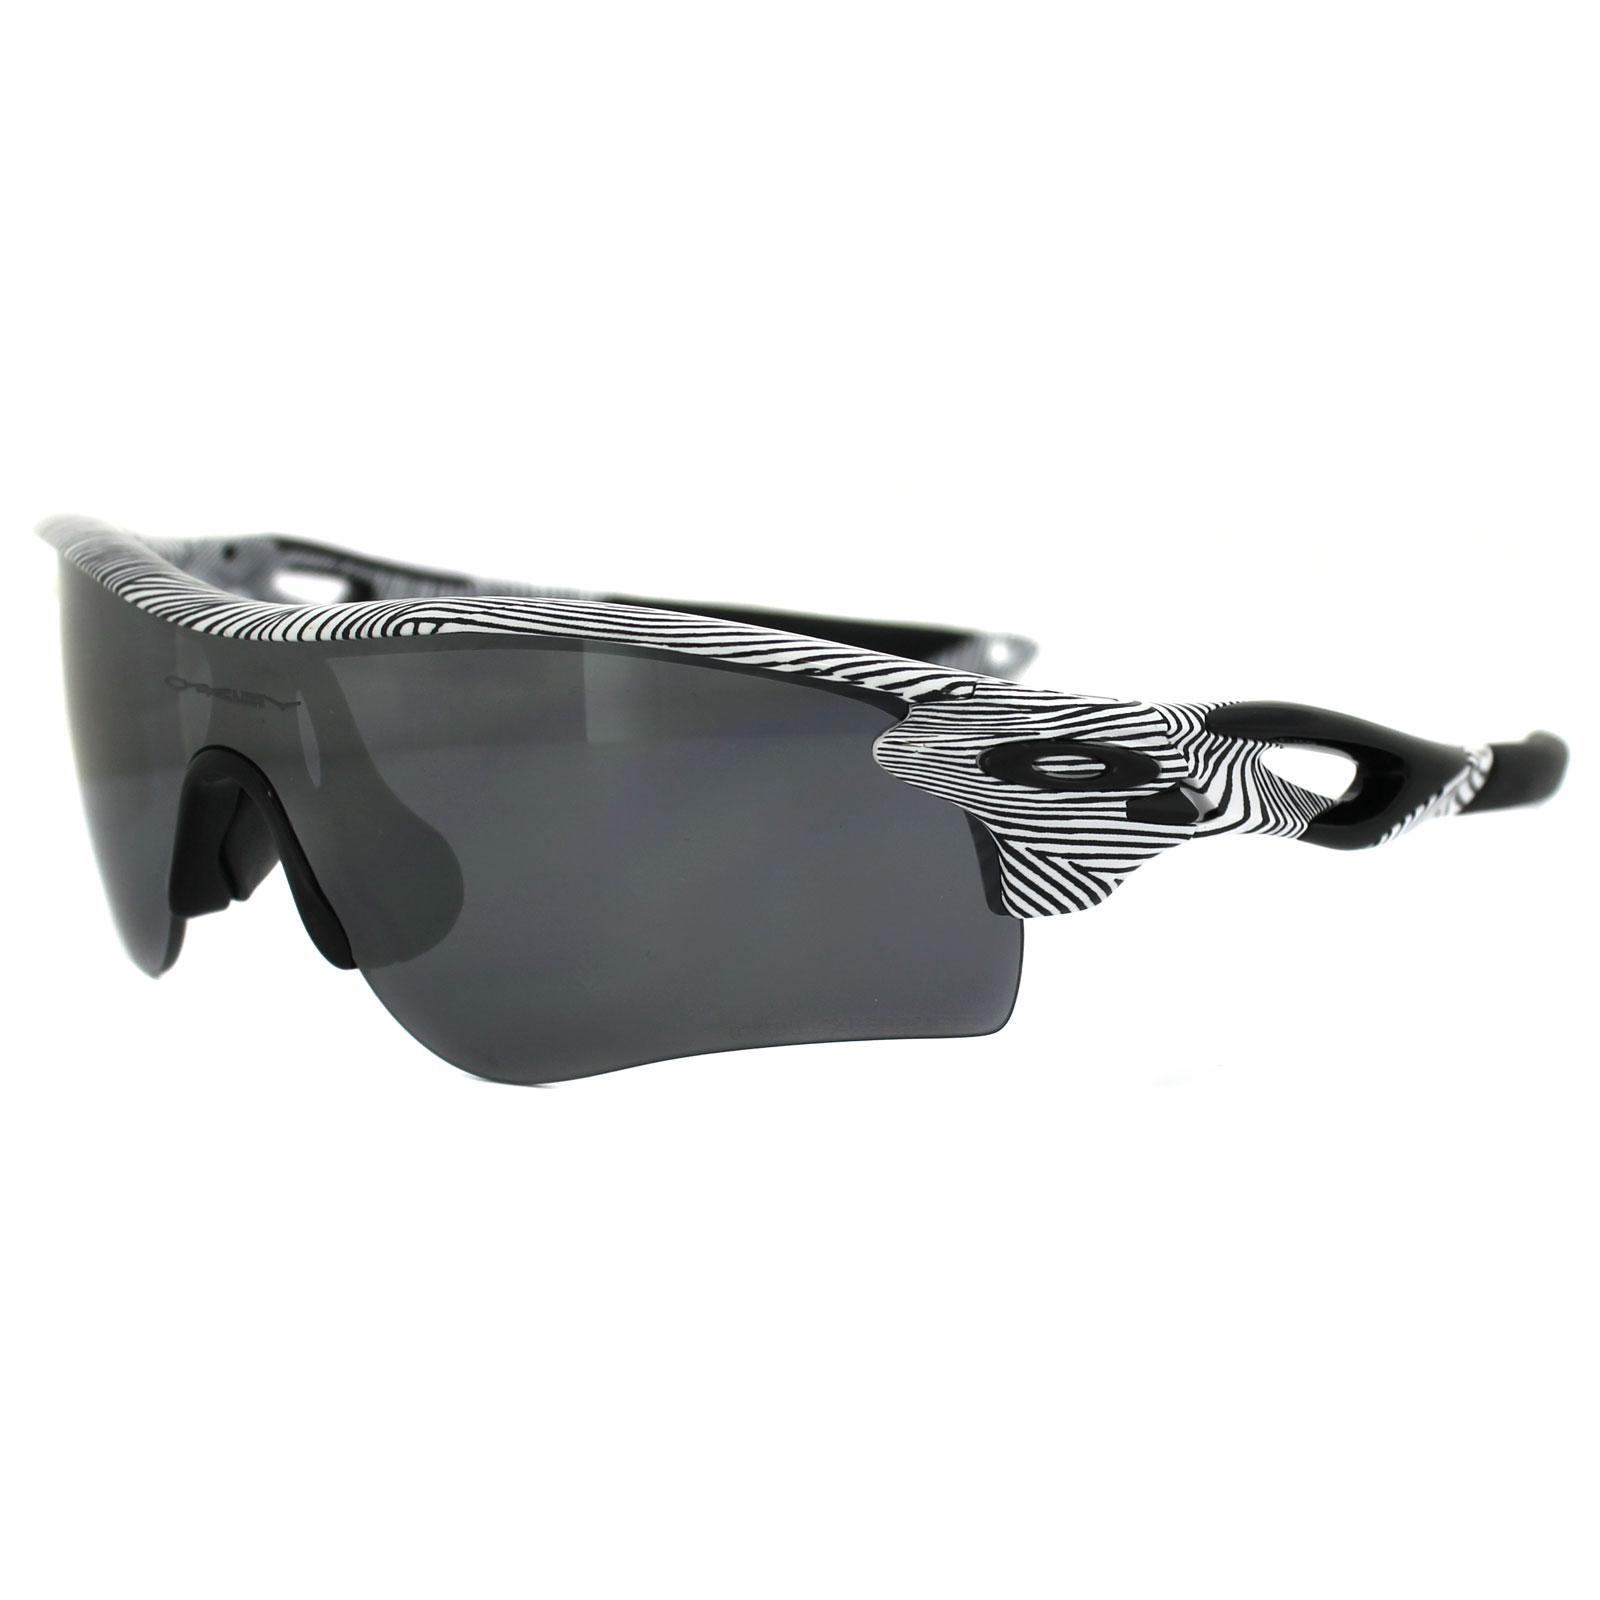 oakley radarlock polarized lenses u8qu  oakley radarlock polarized lenses